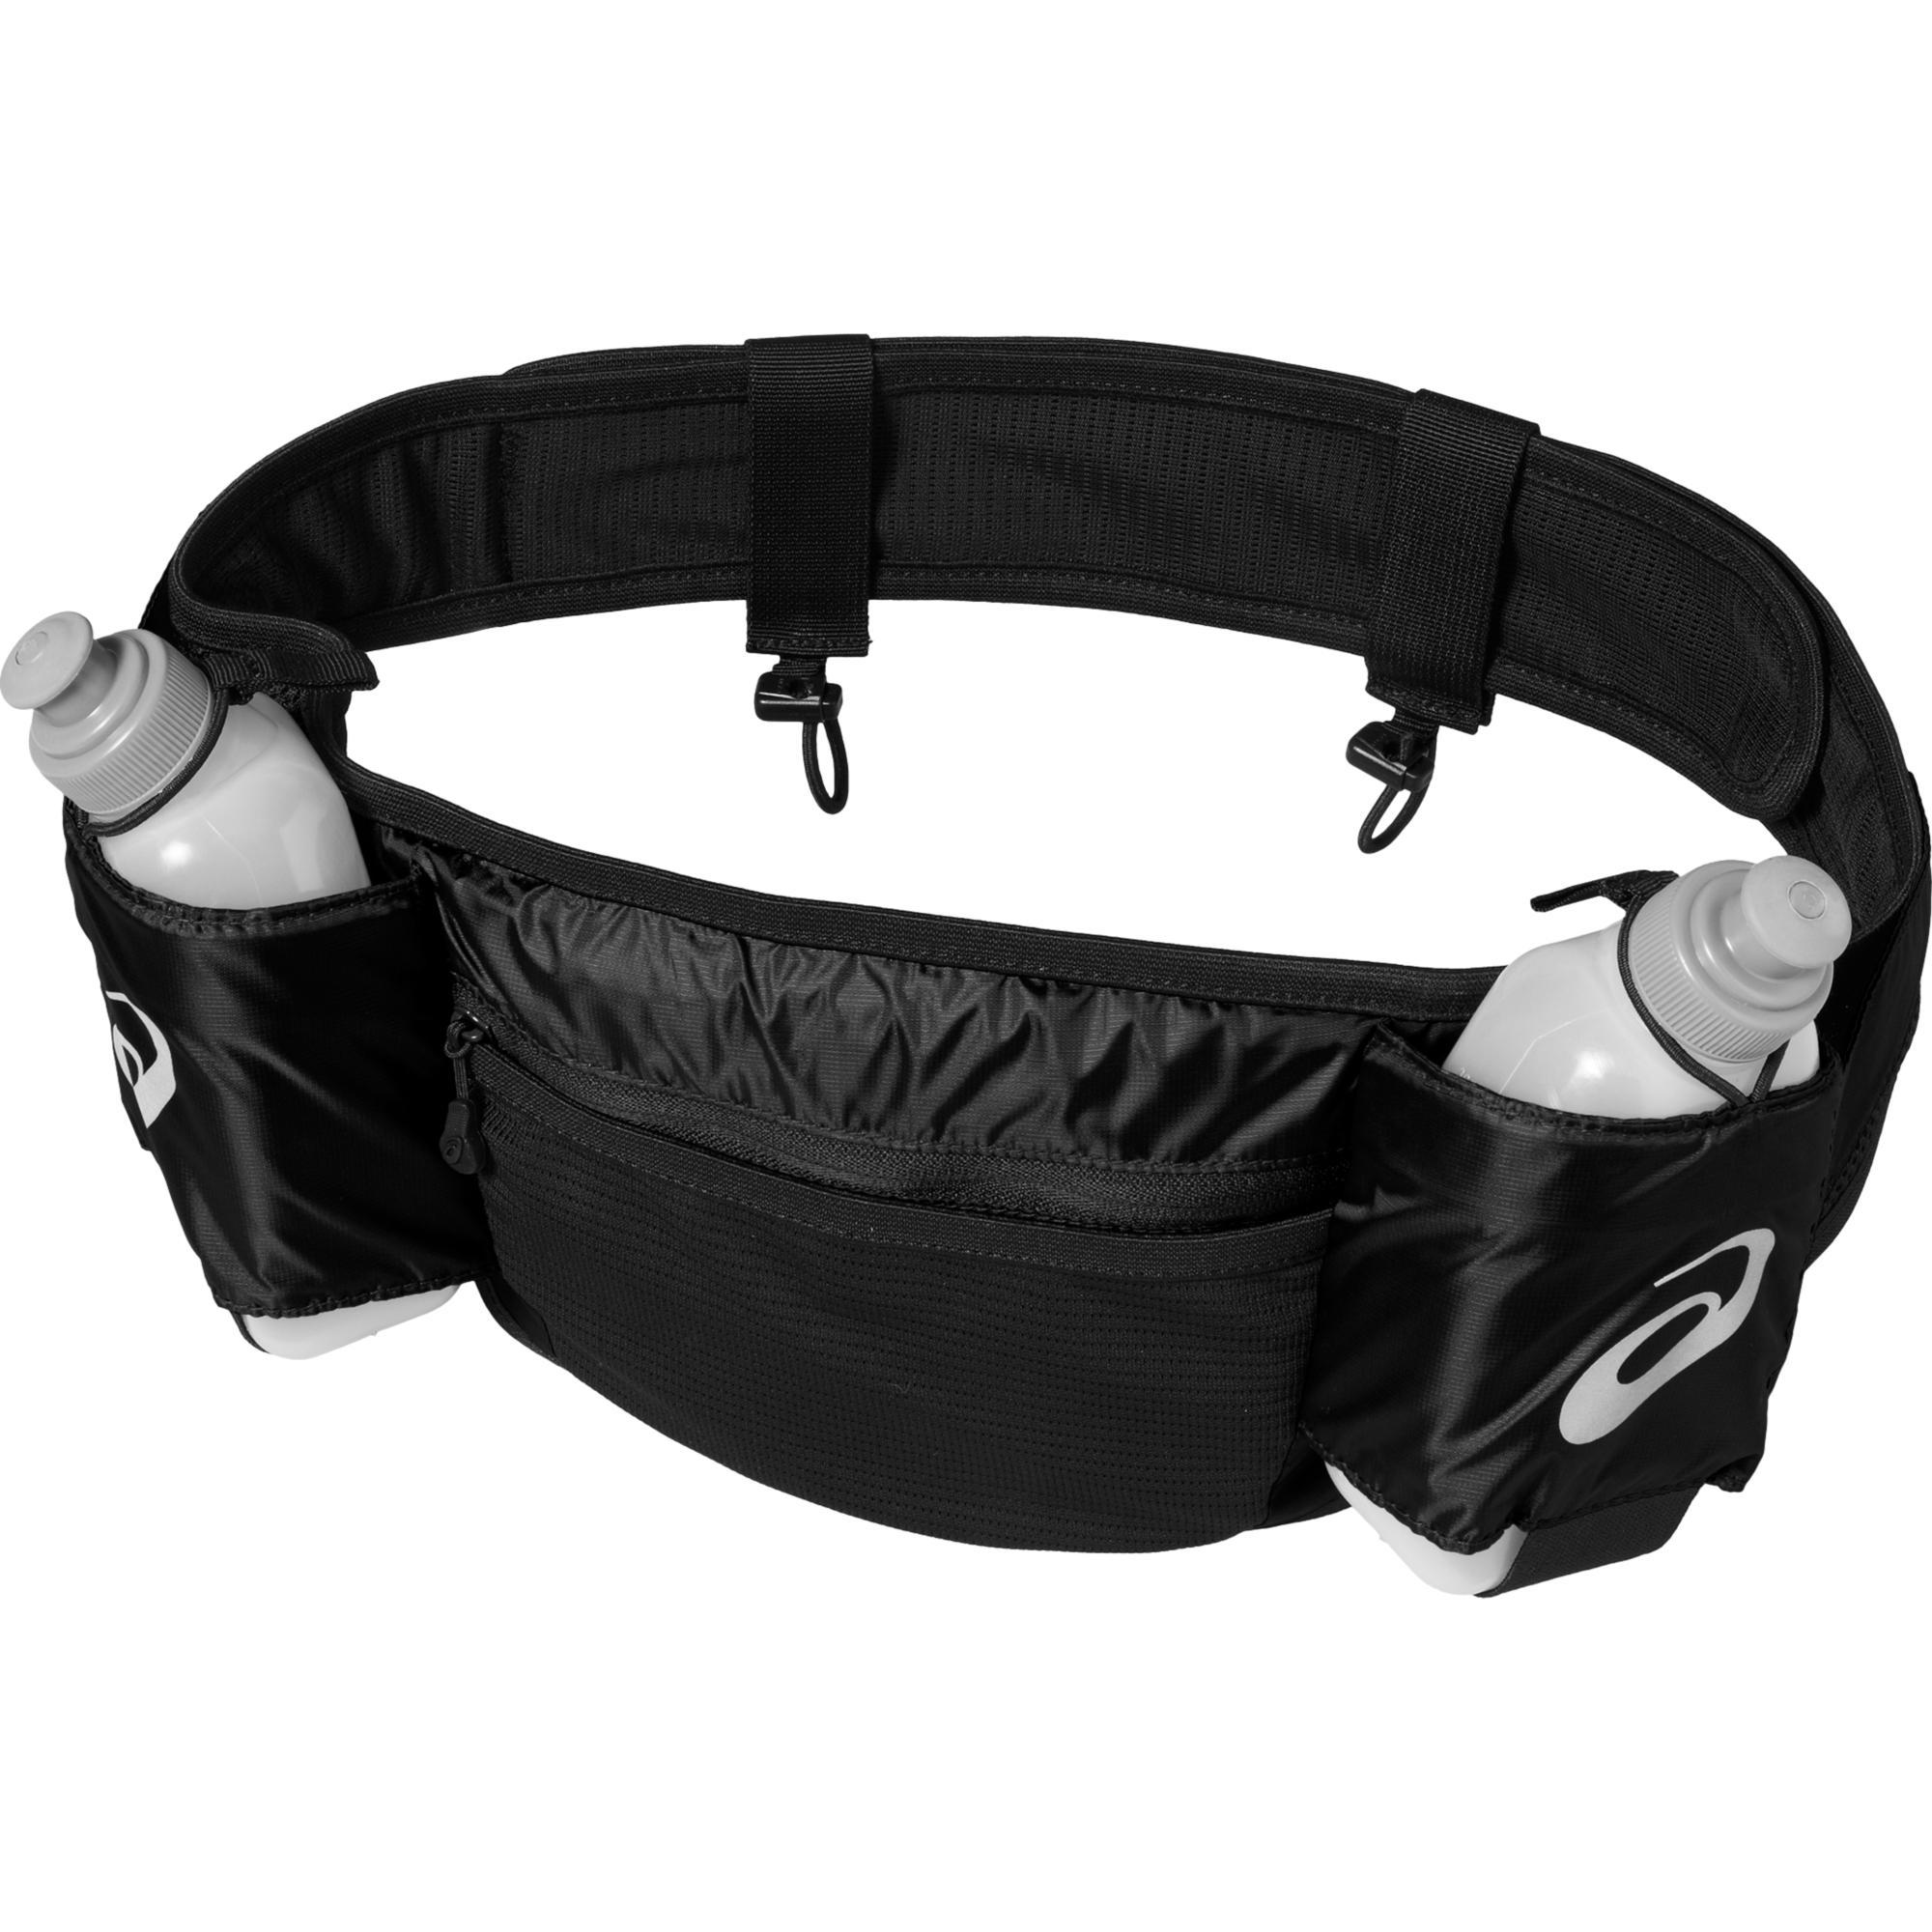 Asics Runners Waist Belt - Black